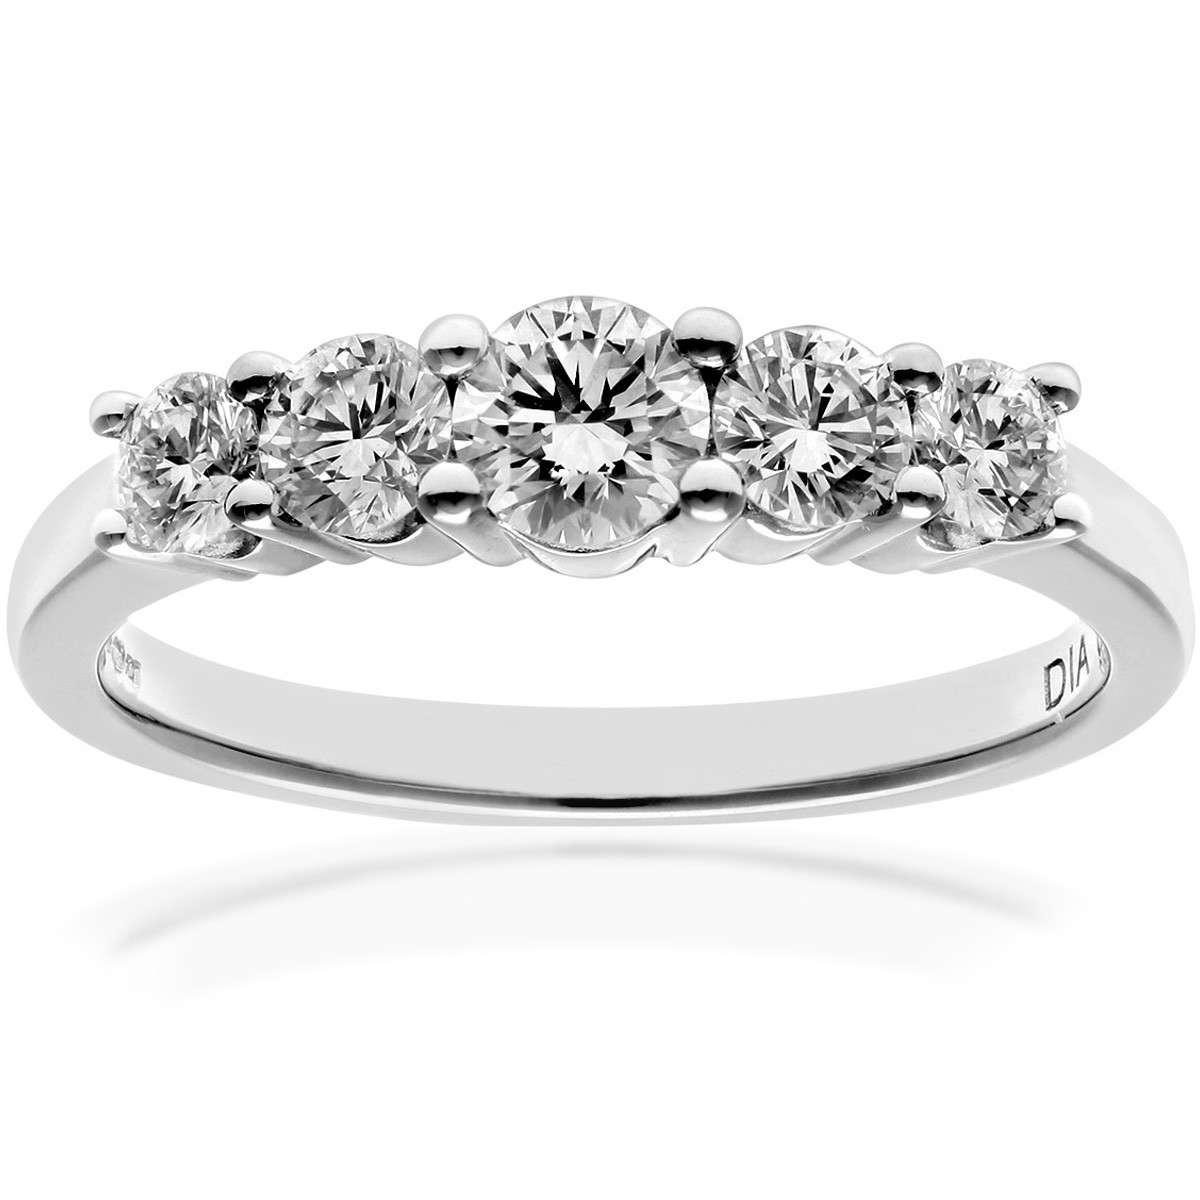 18CT WHITE GOLD 0.75CT DIAMOND 5 STONE GRADUATE ETERNITY RING